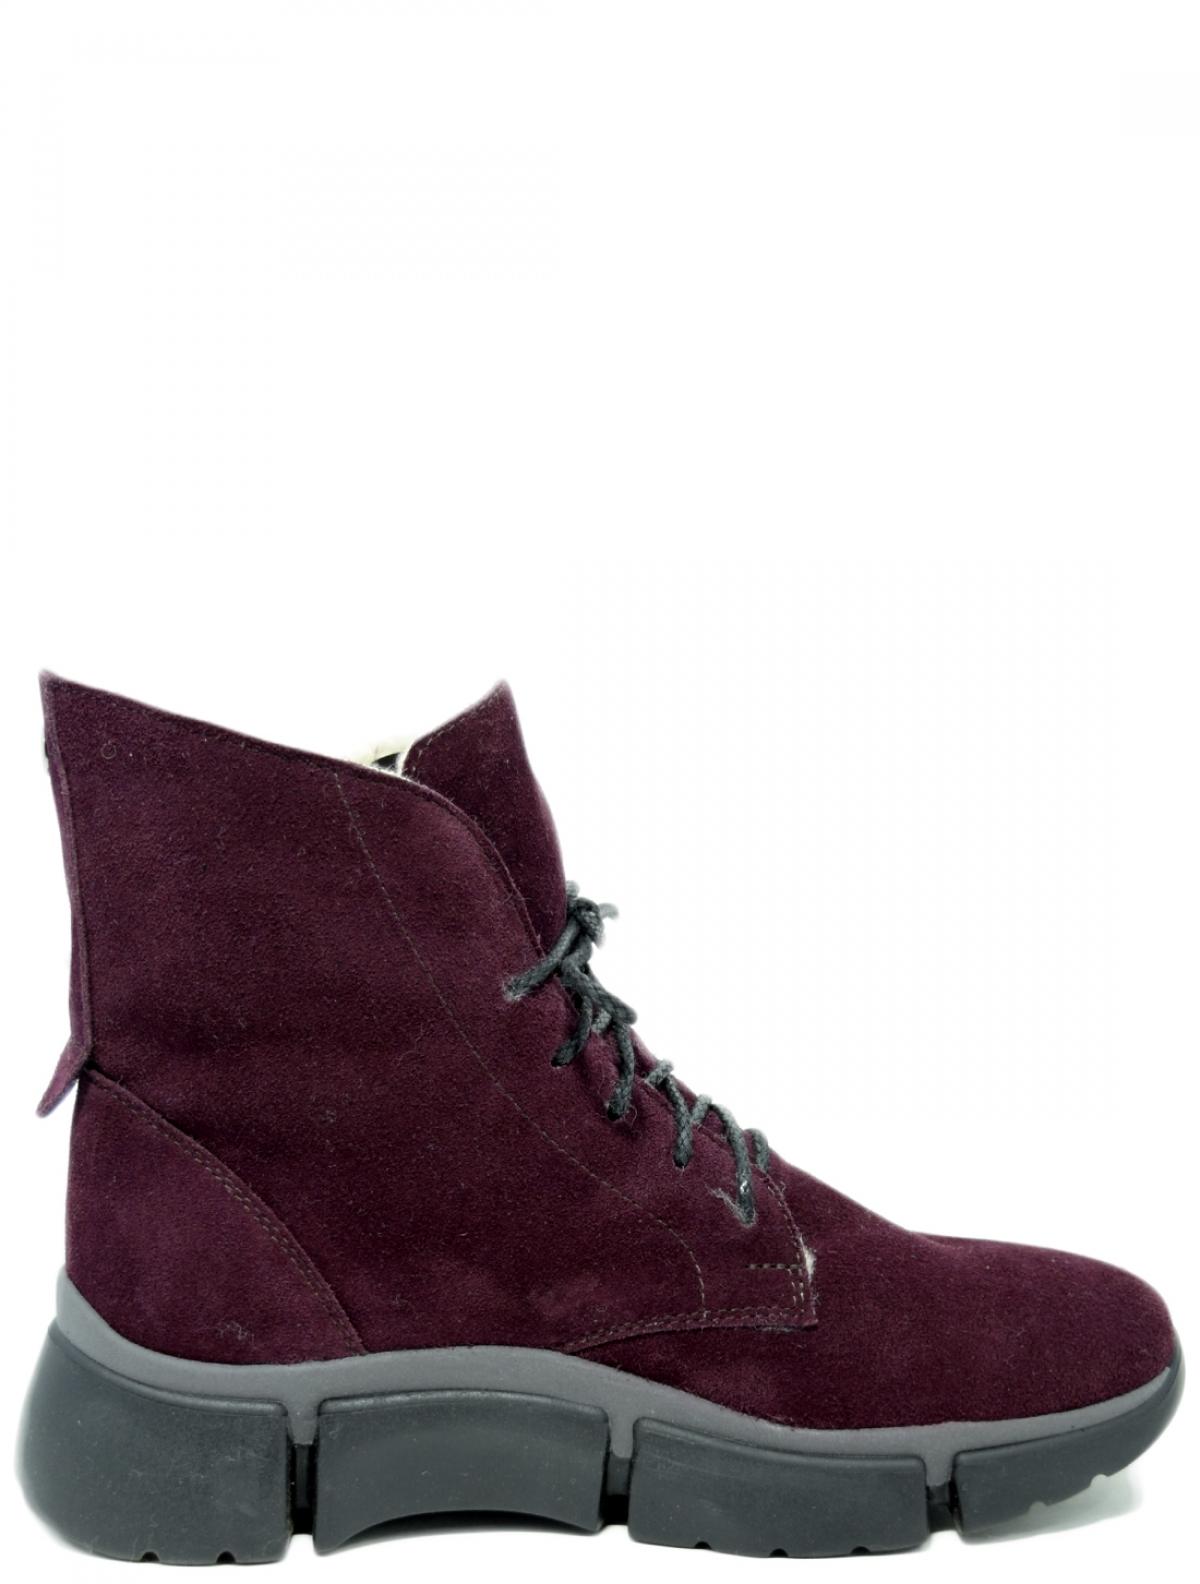 Selm 1839/1-48 женские ботинки